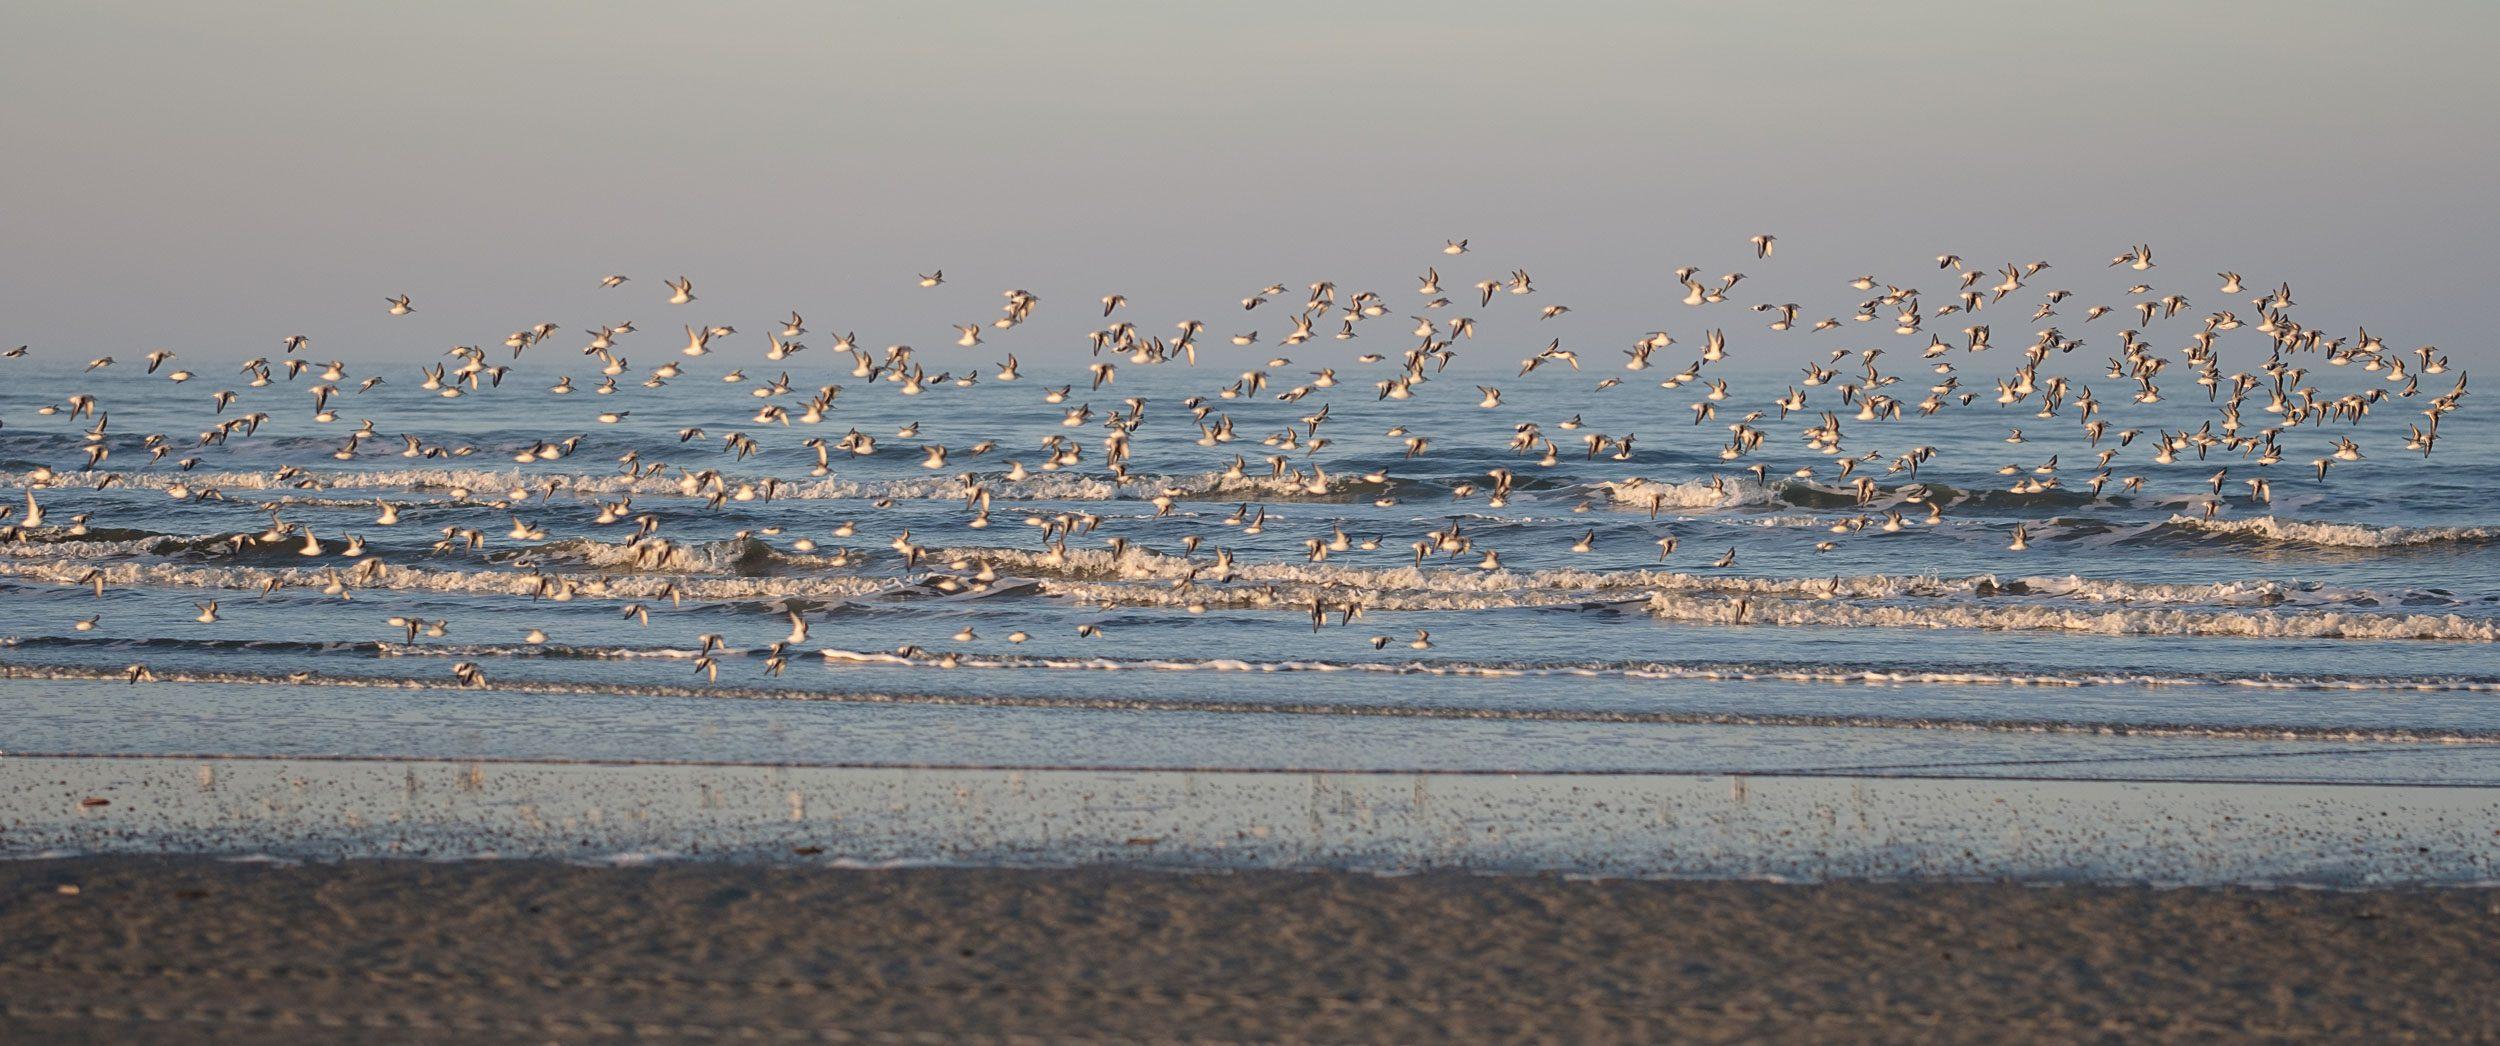 Vögel am Strand